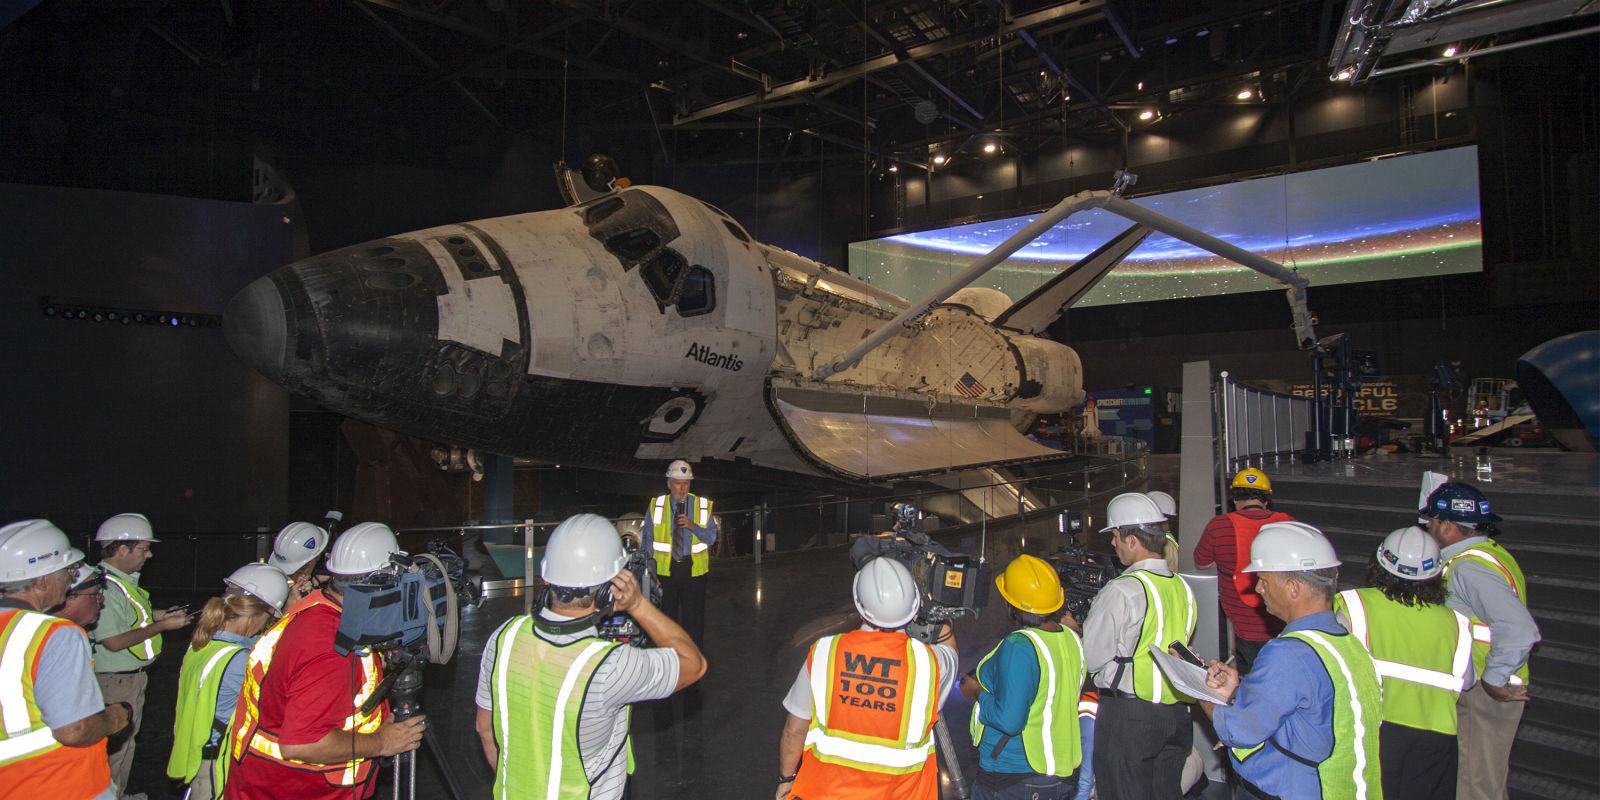 us space shuttle atlantis - photo #29